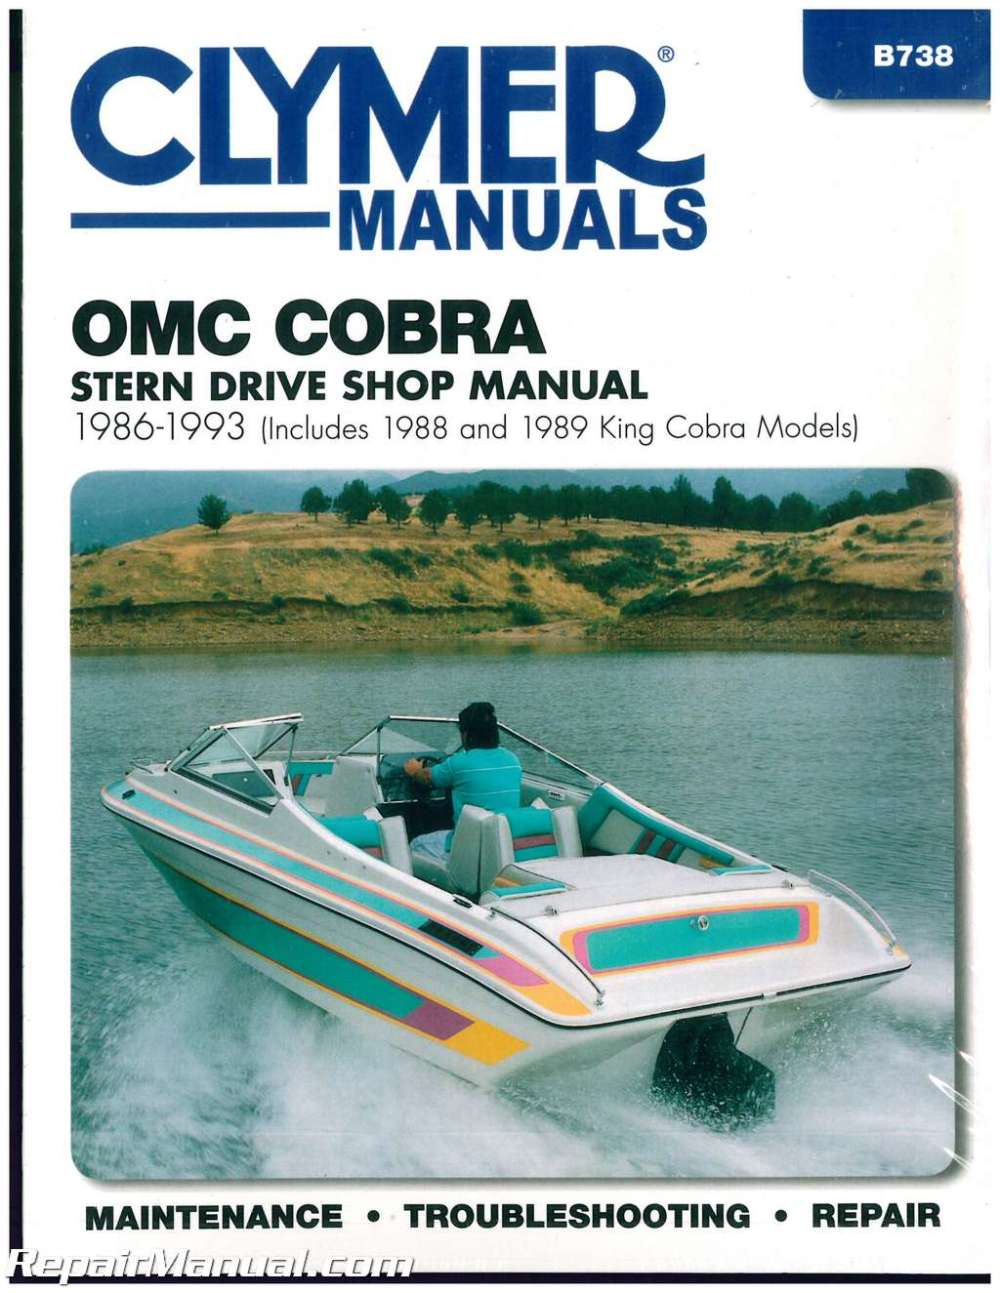 medium resolution of 93 omc wiring diagram wiring diagram weekclymer omc cobra 1986 1993 stern drive boat engine repair